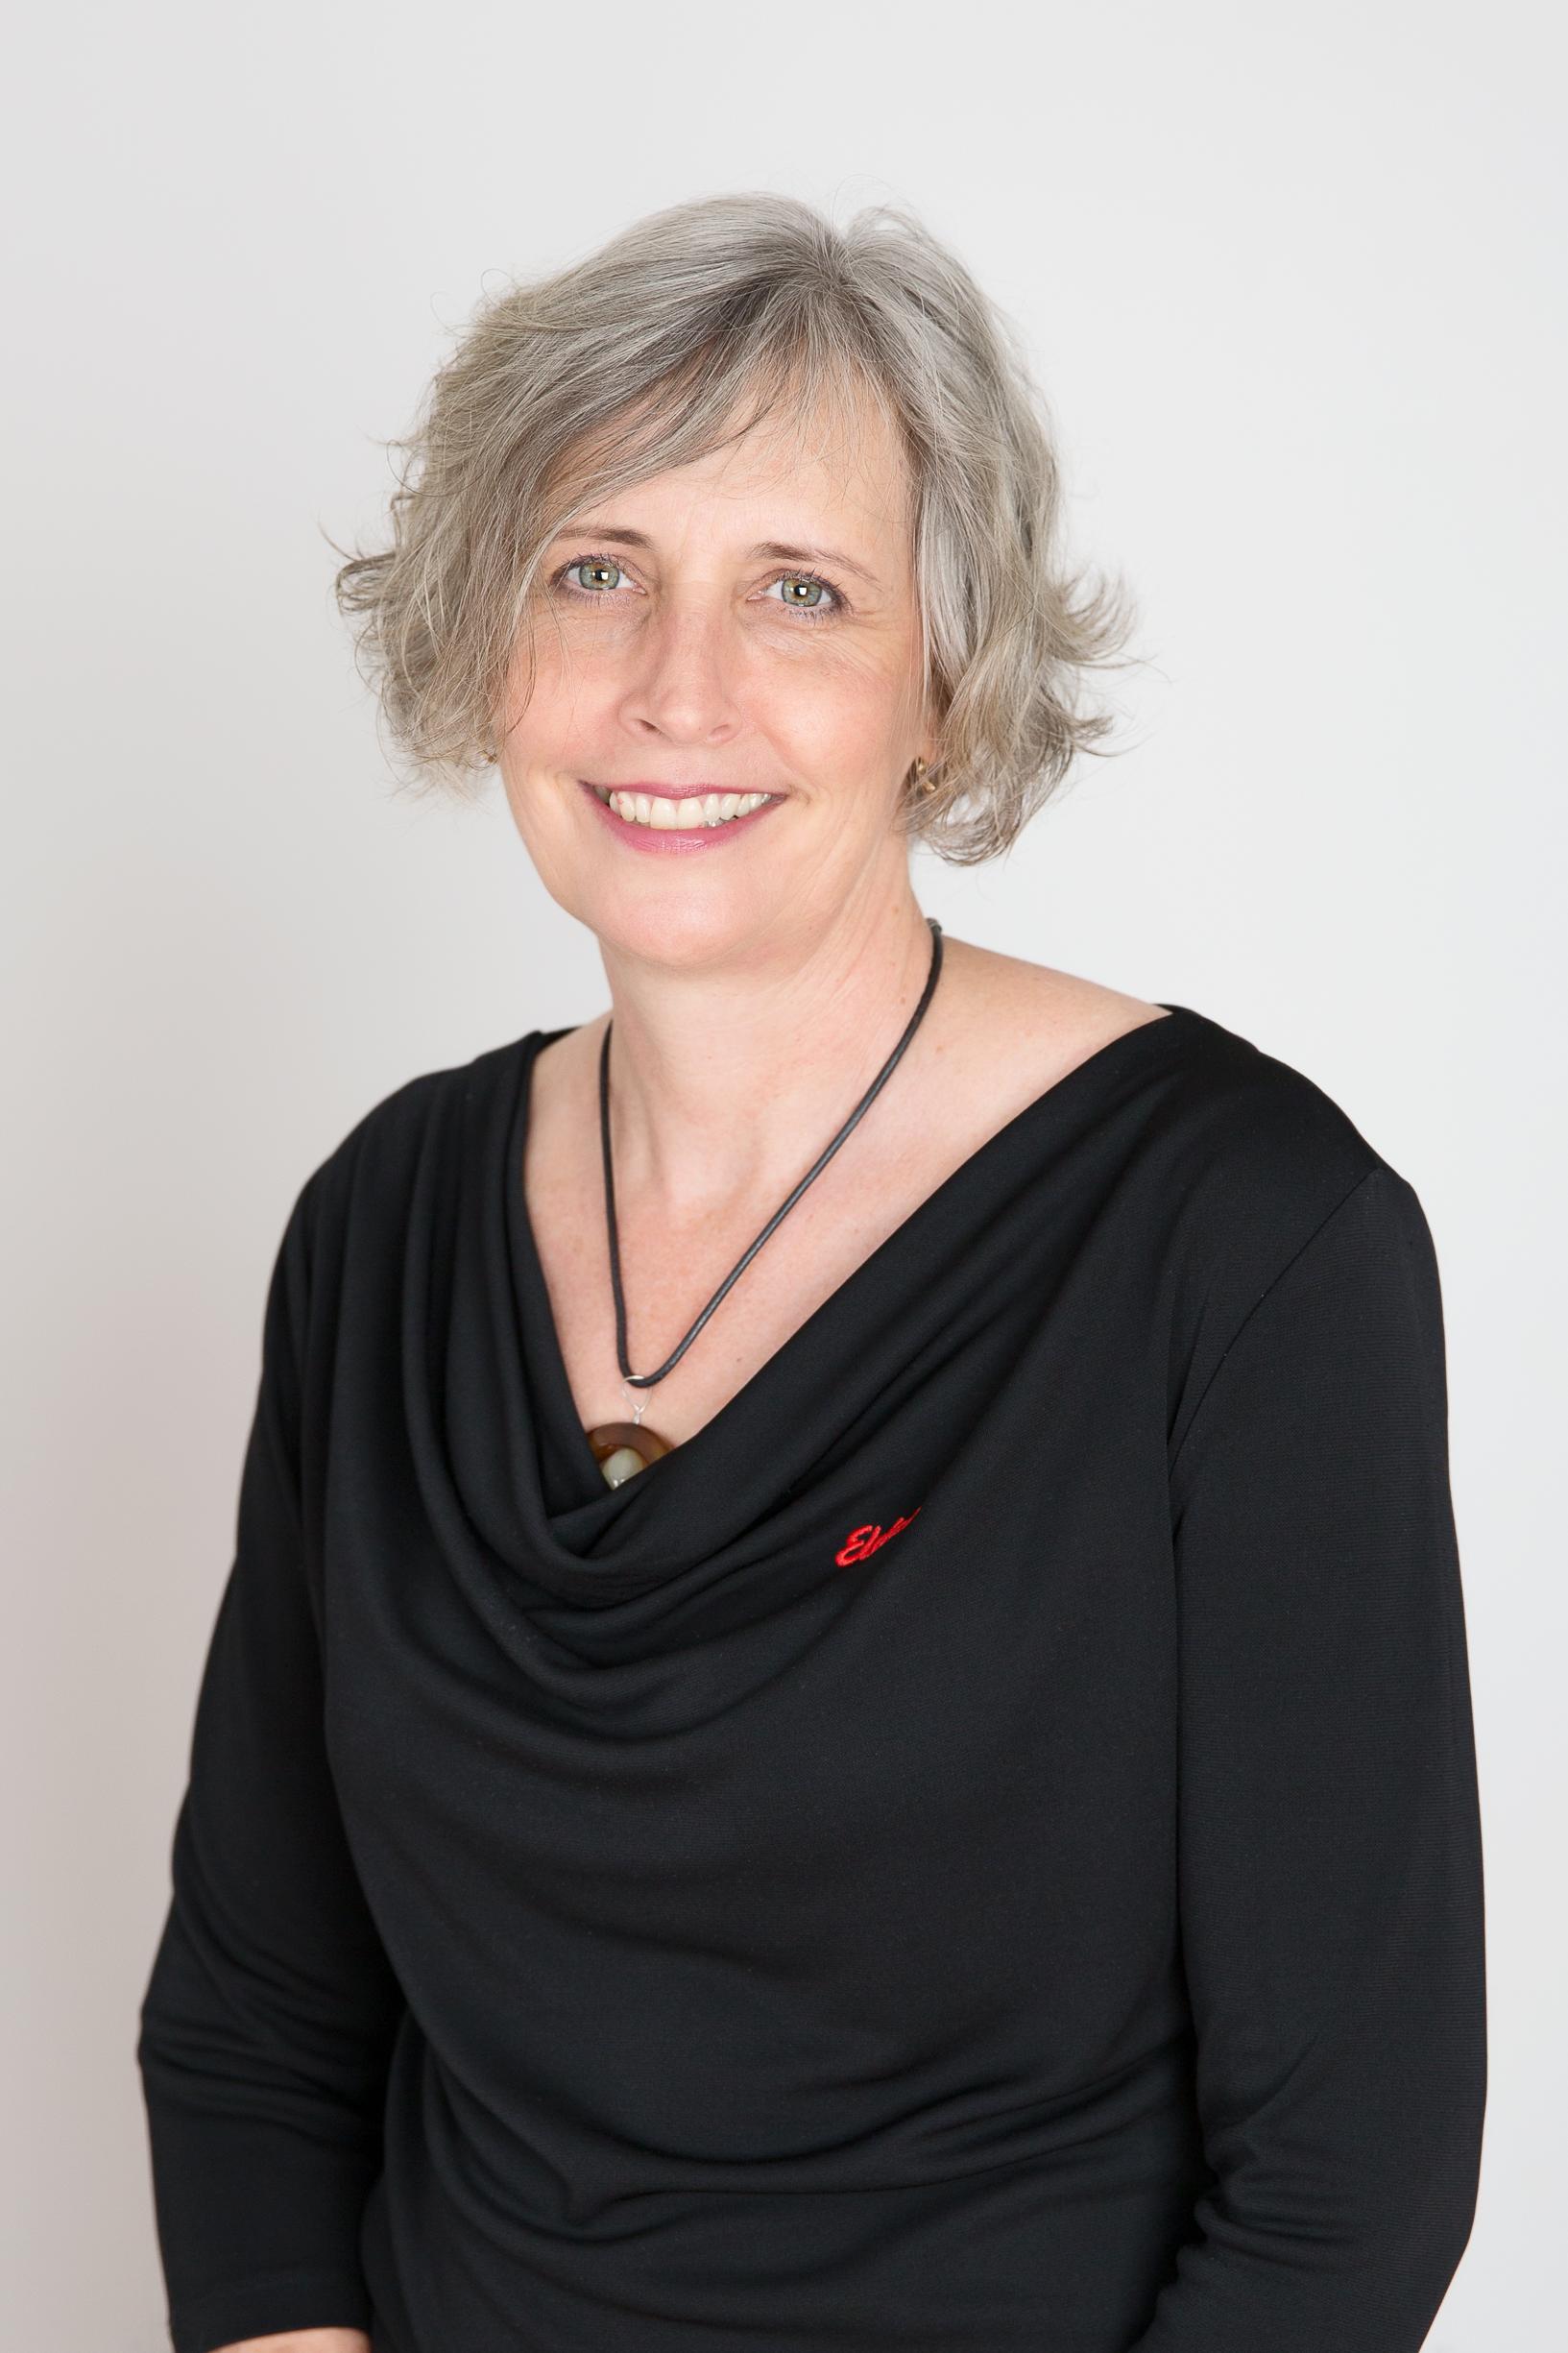 Cheryl Matthews